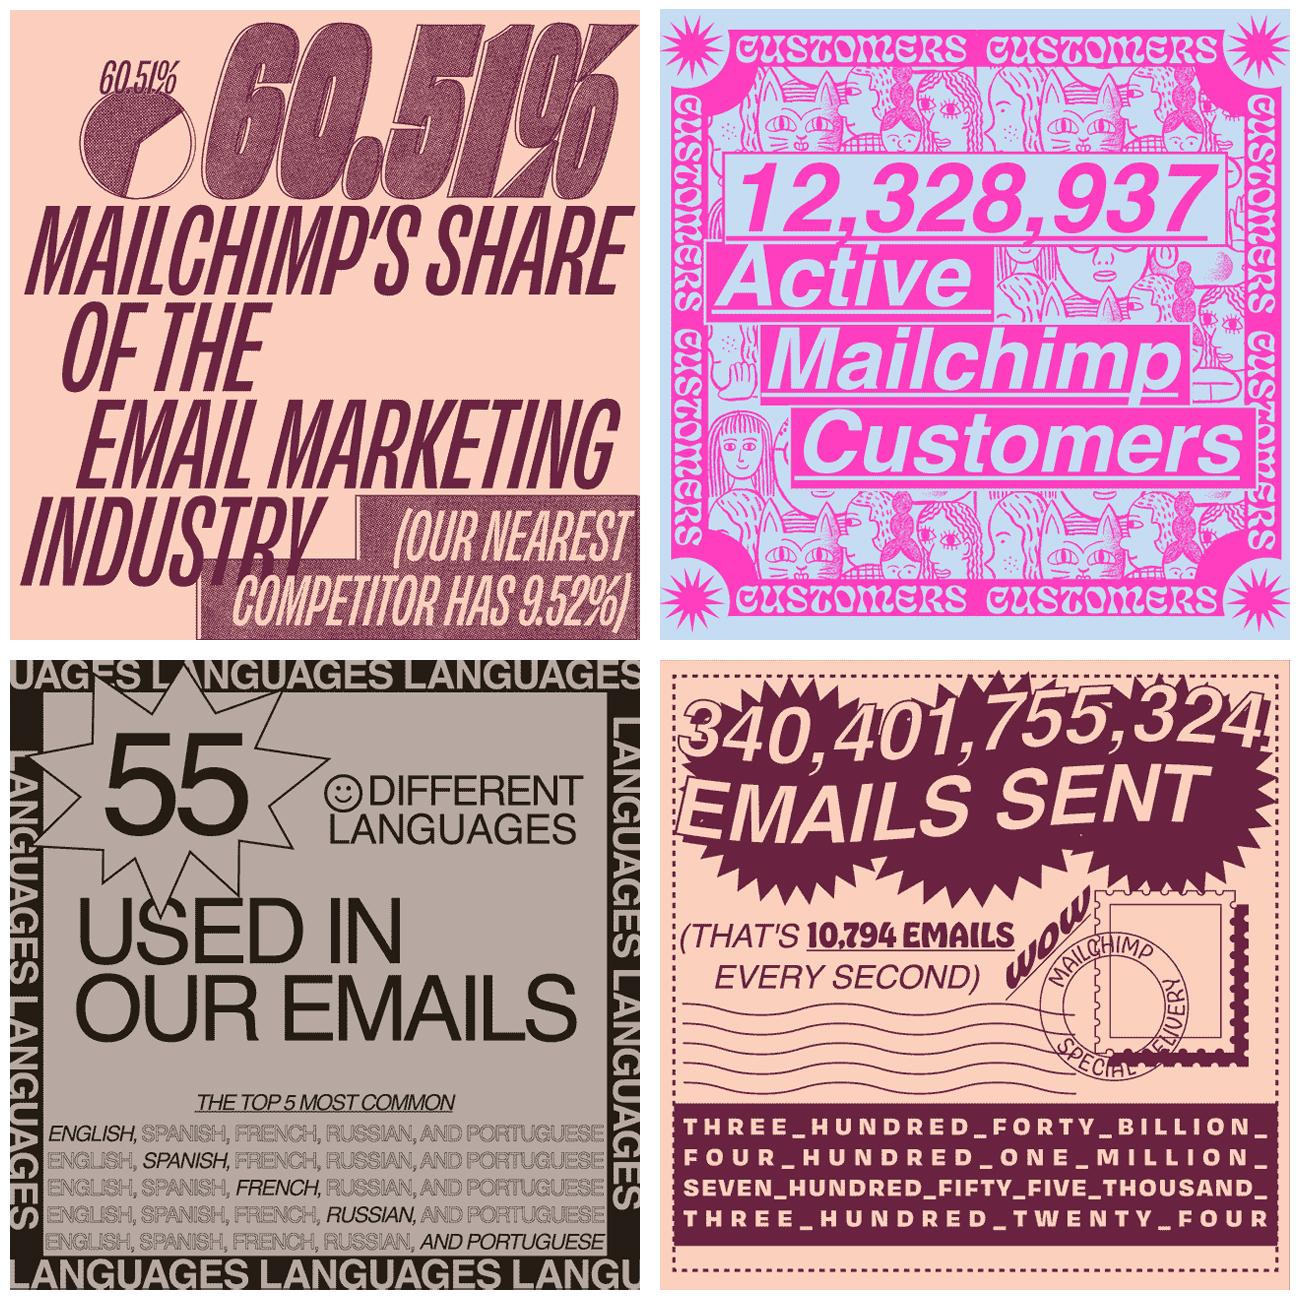 MailChimp's stats 2019